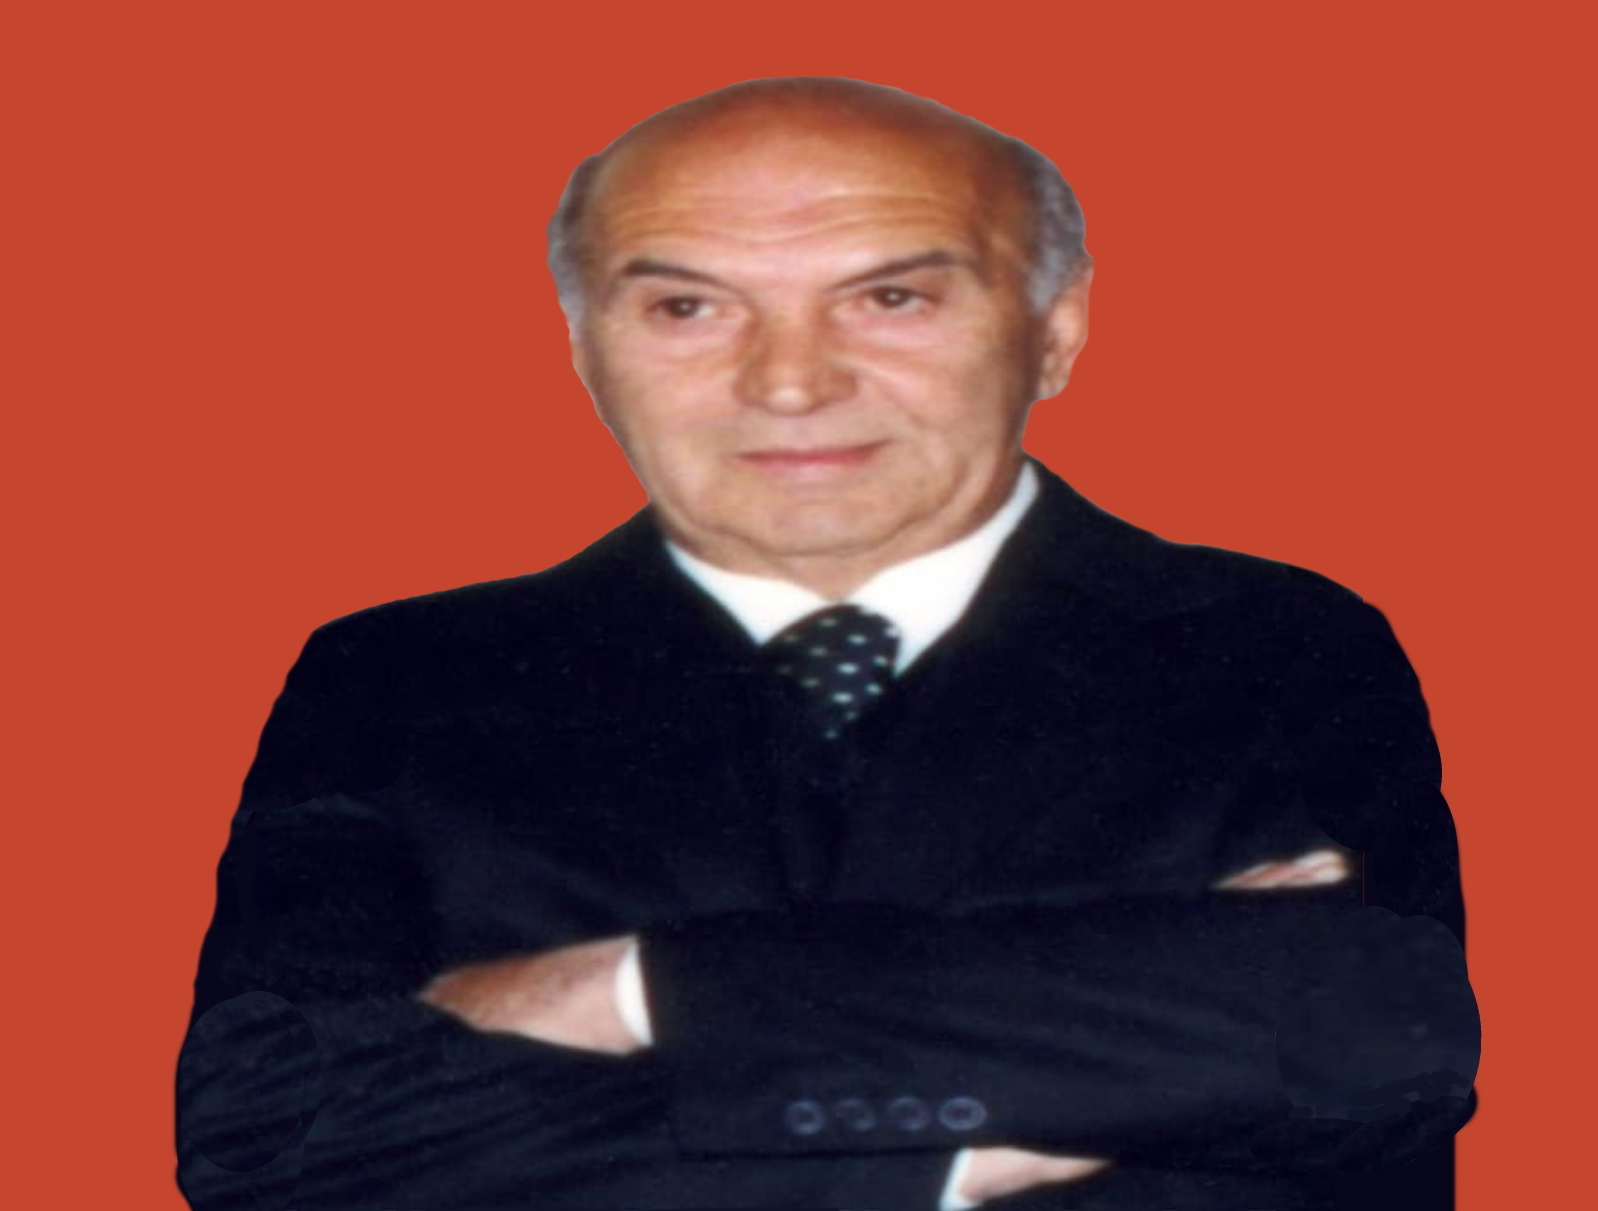 Avv. Fernando Rolli